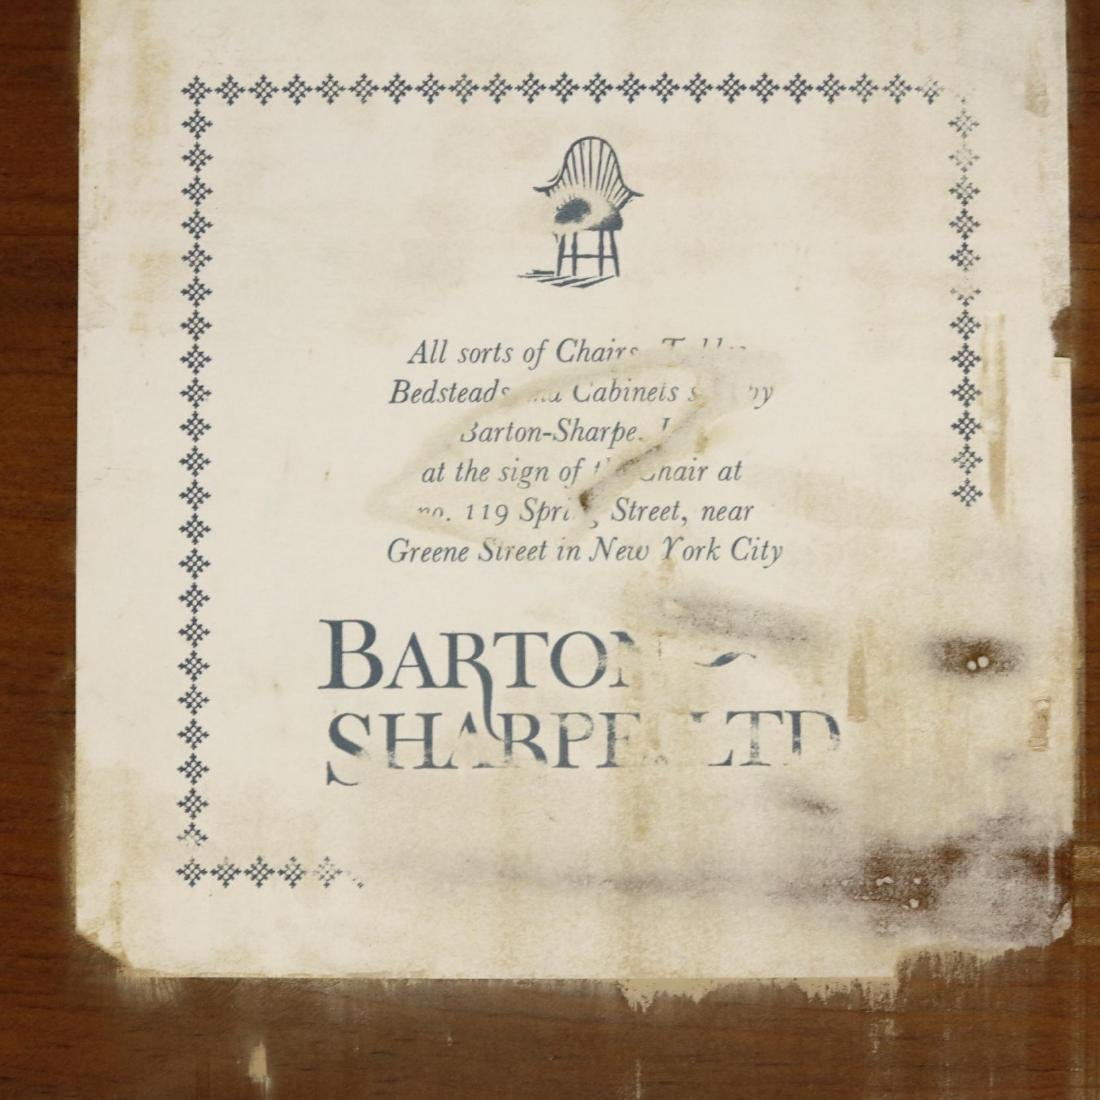 Barton Sharpe, Custom Tiger Maple Executive Desk and - 6